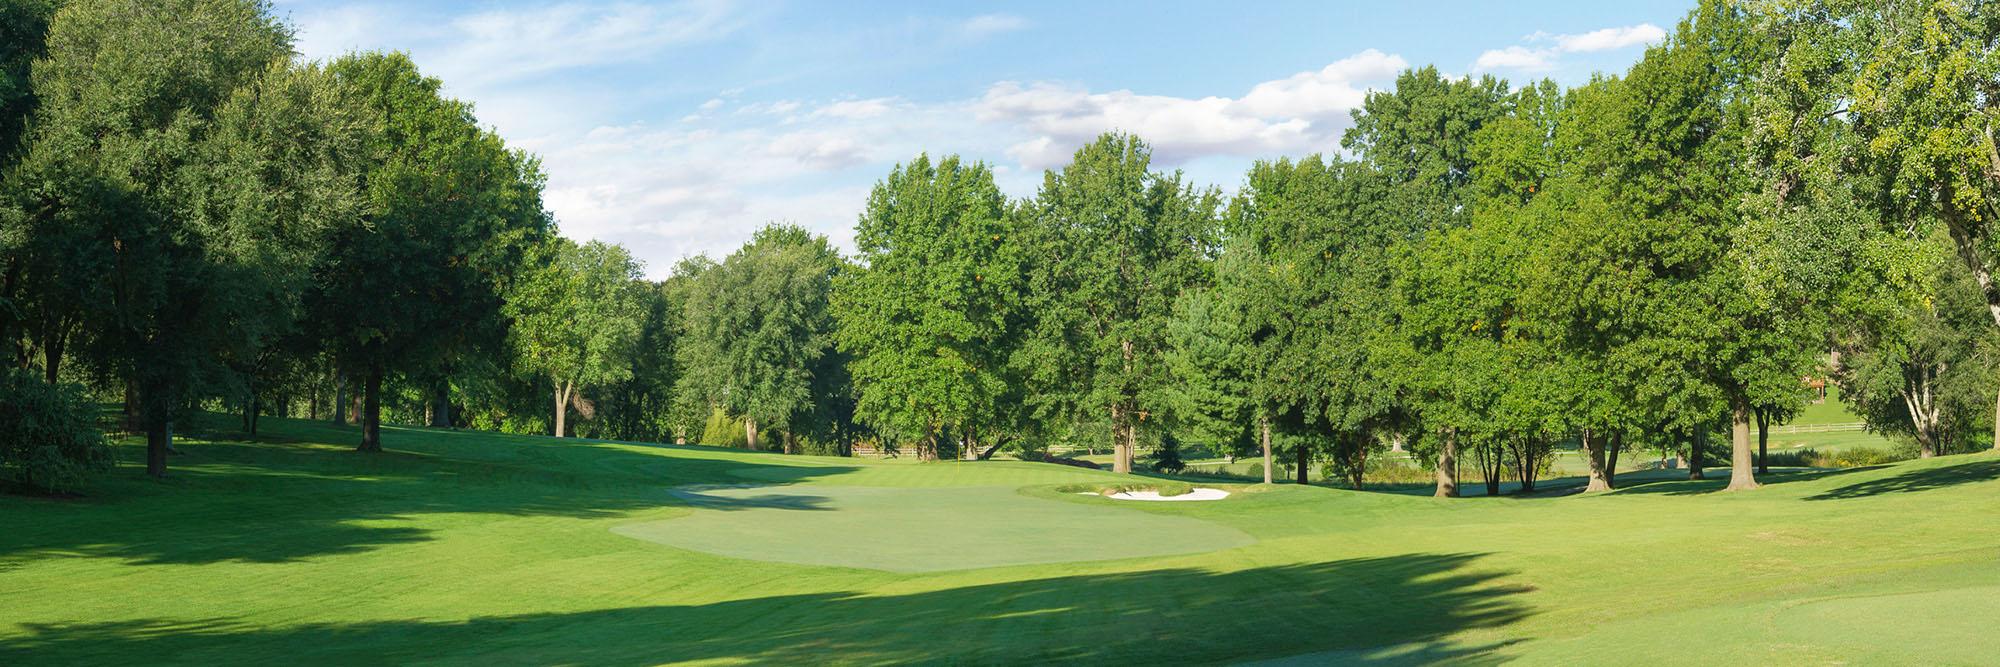 Twin Oaks Country Club